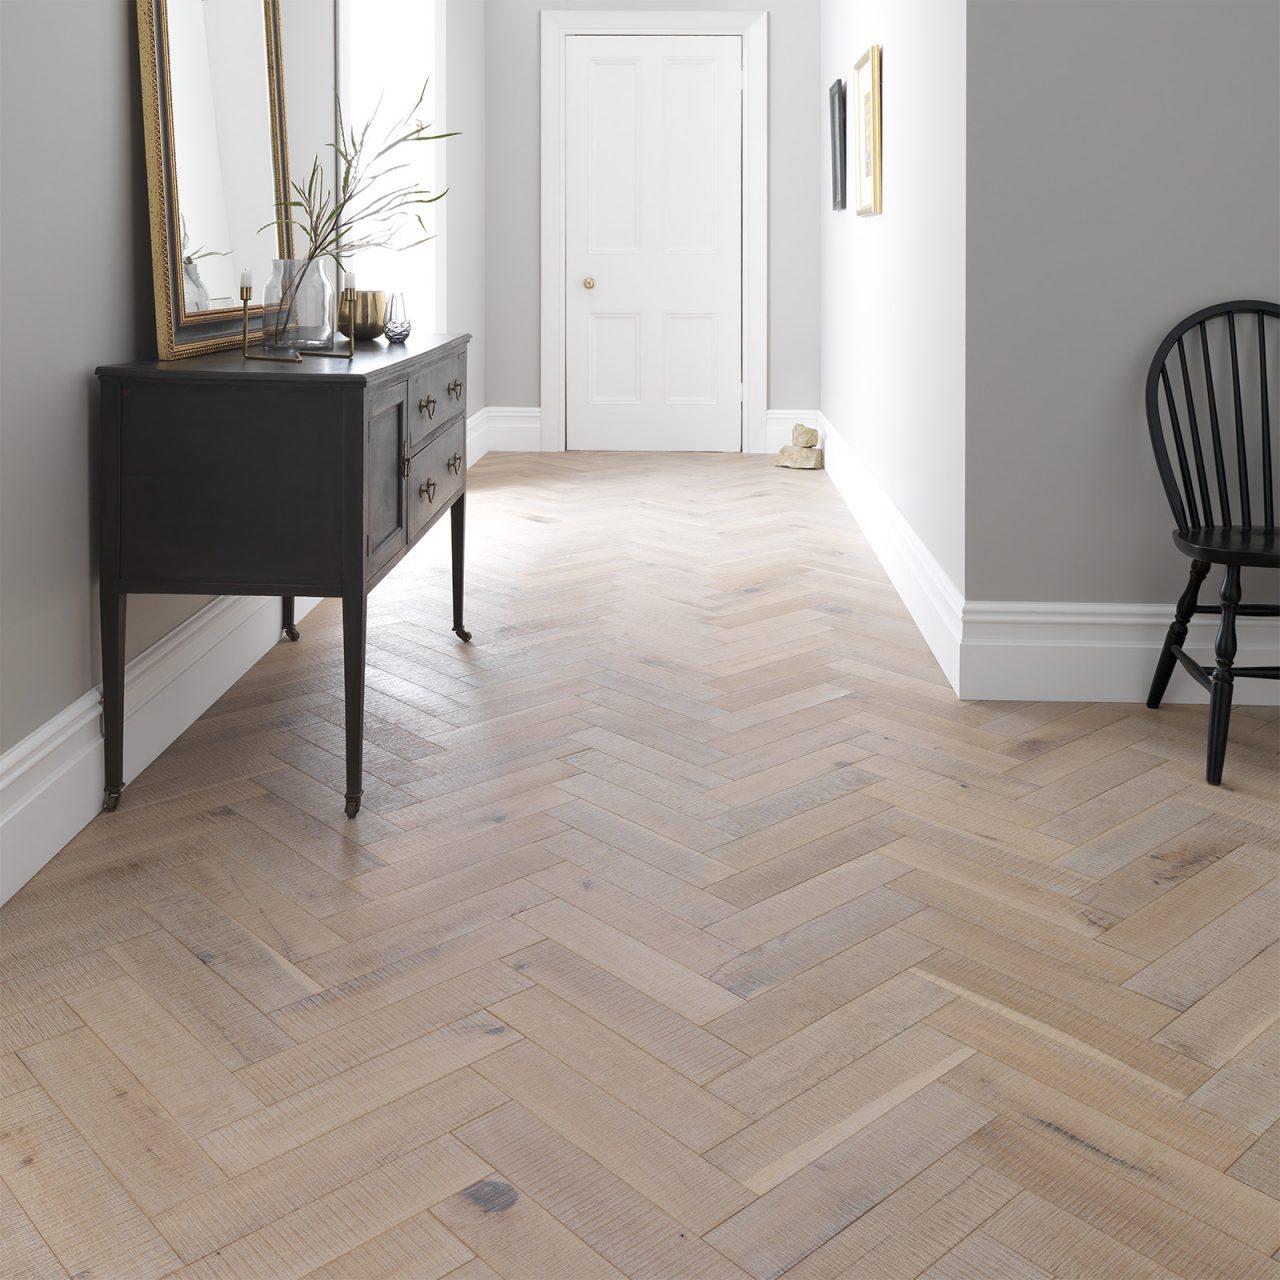 Beautiful hallway with herringbone flooring